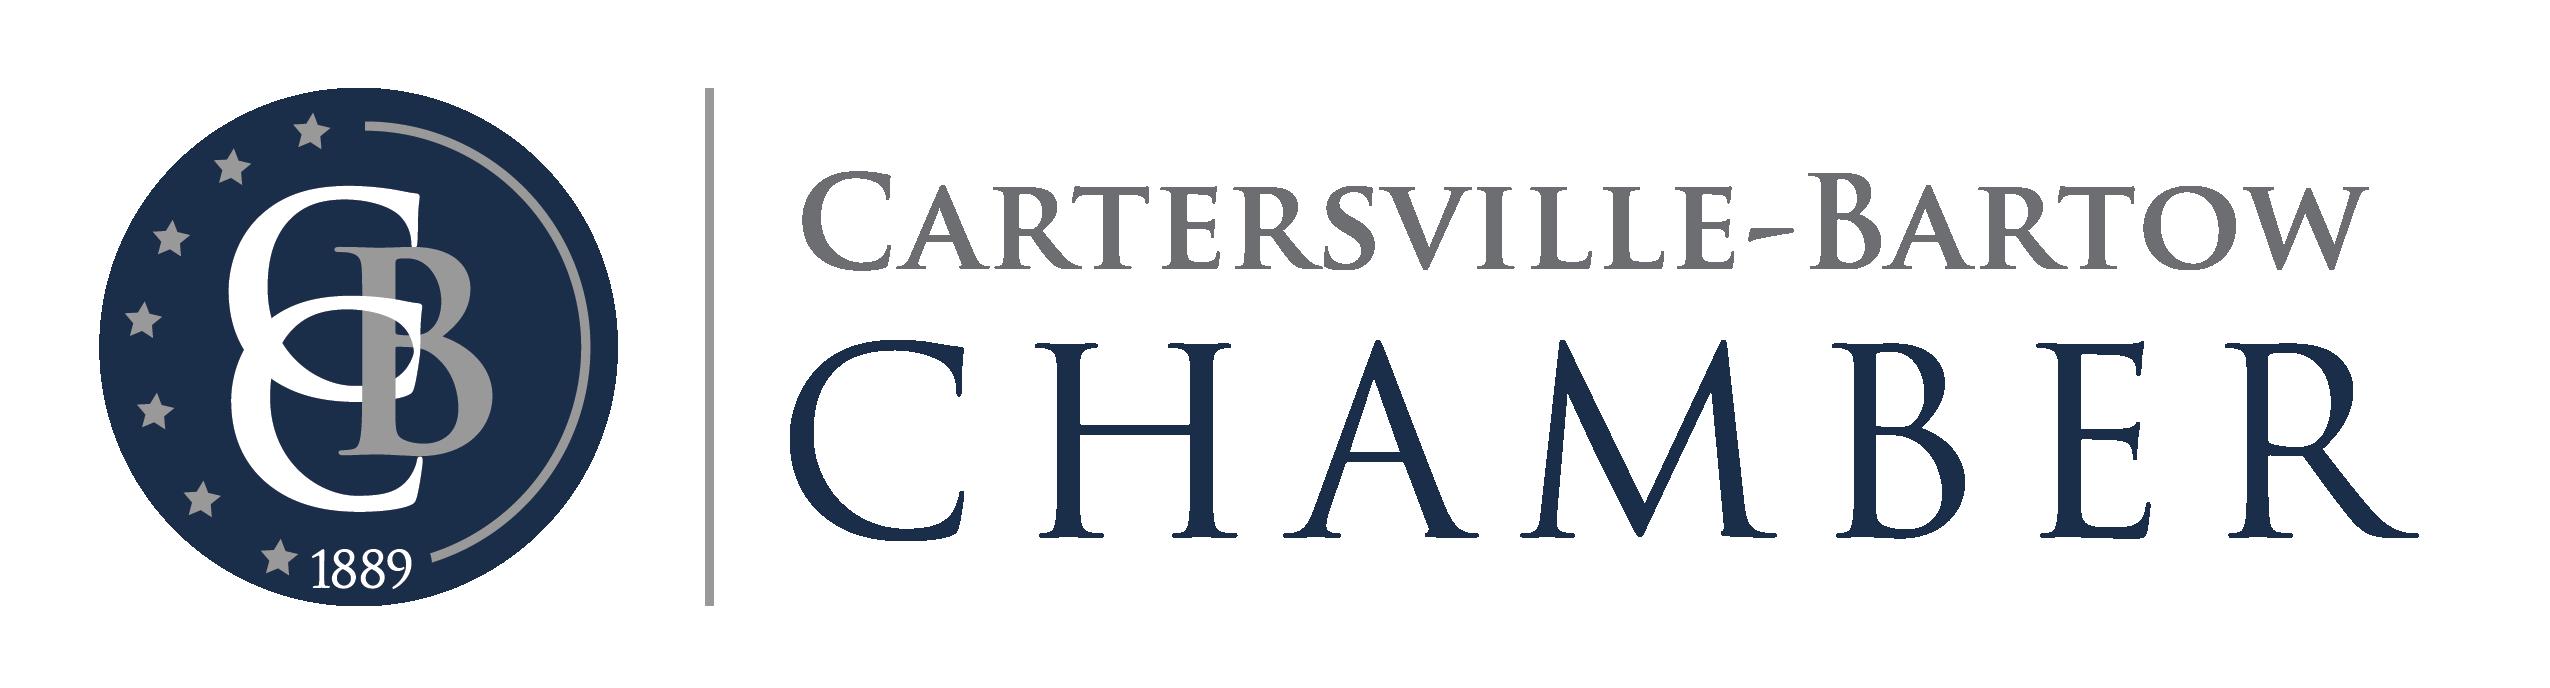 Cartersville-Bartow Chamber Logo